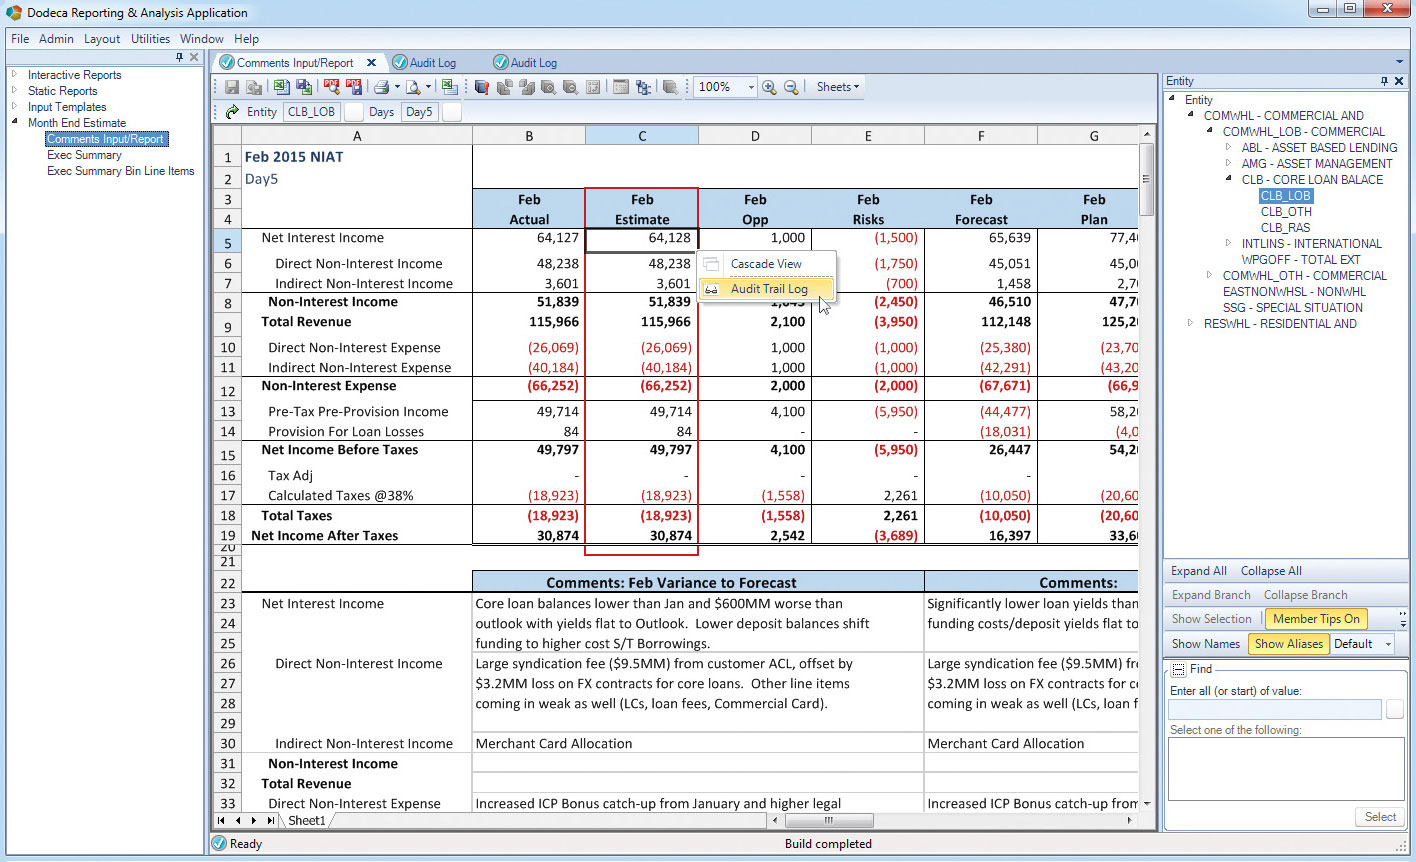 Spreadsheet Management Within Managing Spreadsheet Risk: Dodeca Spreadsheet Management System